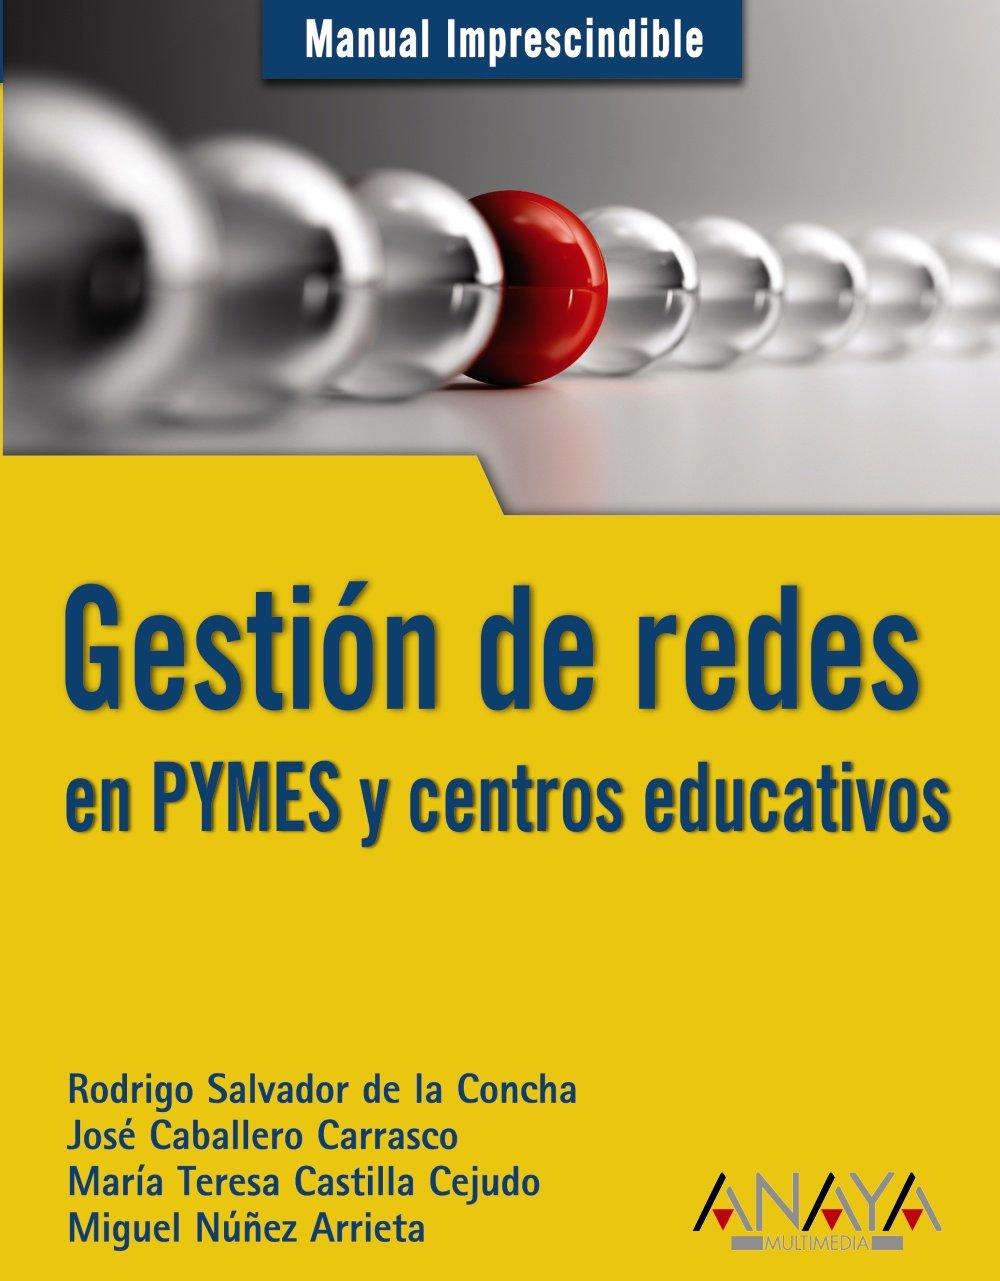 Gestion de redes en PYMES y centros educativos / PYMES Network management and schools (Manuales Imprescindibles) (Spanish Edition) pdf